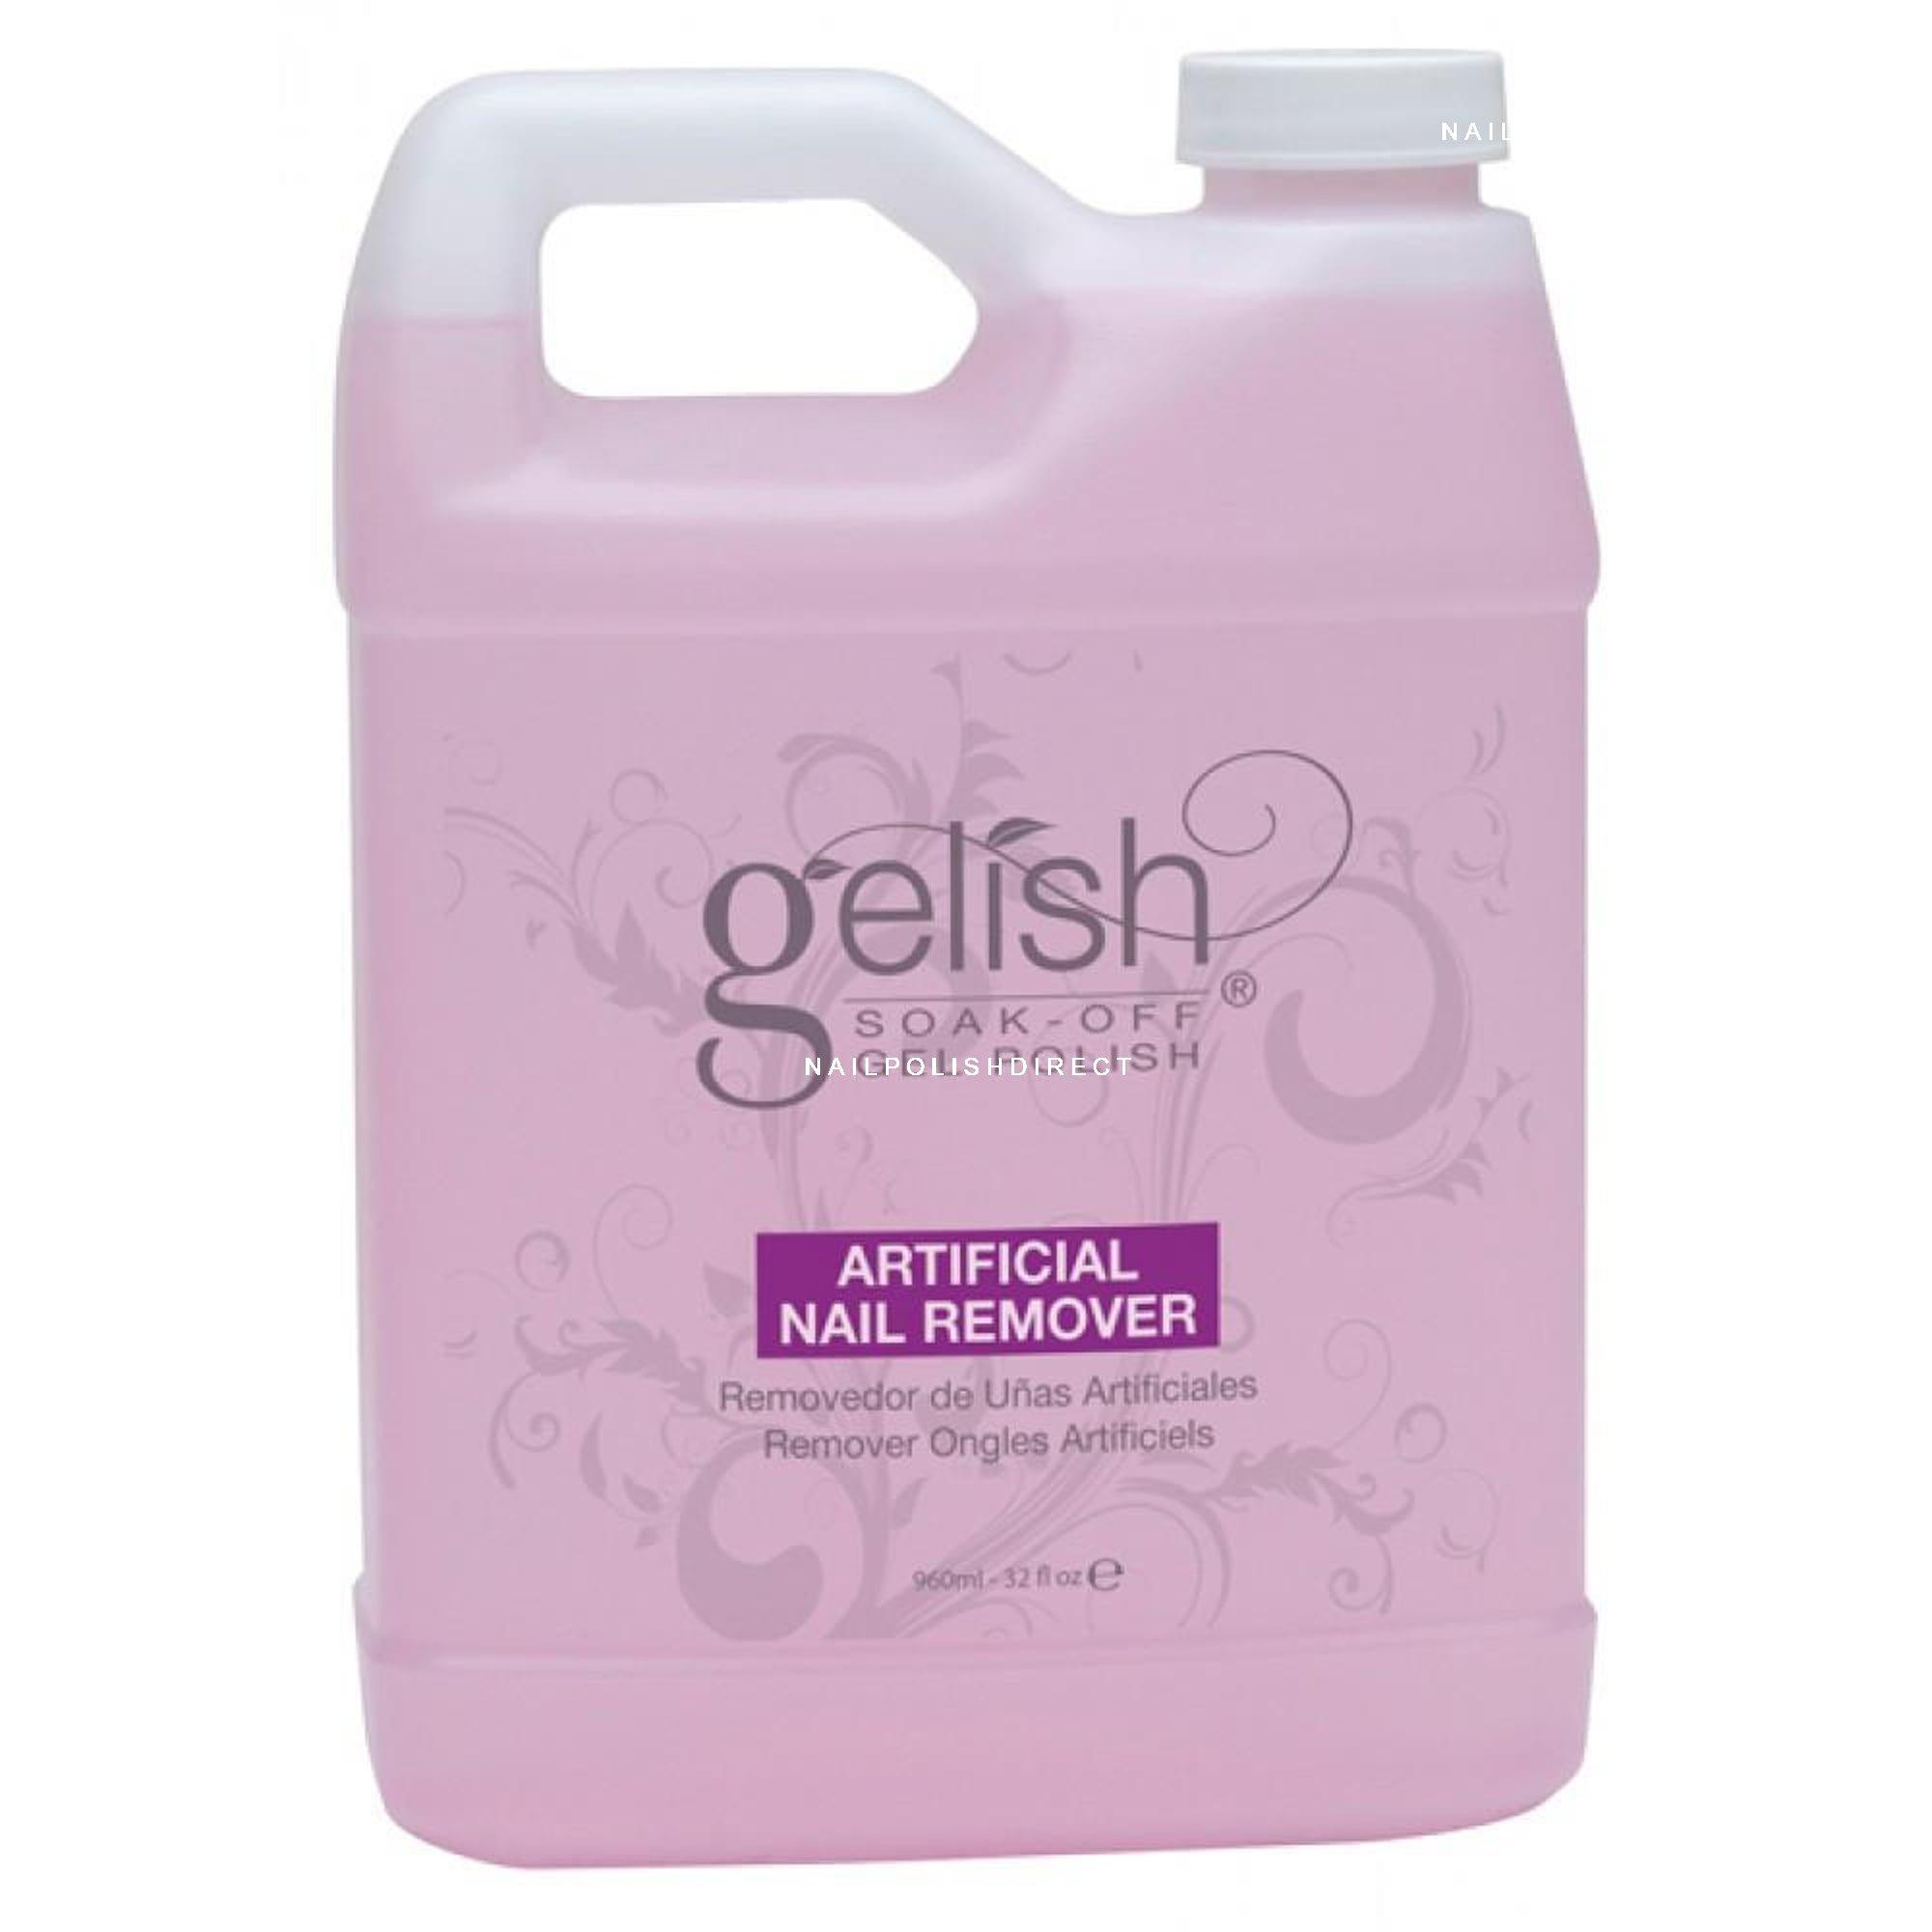 Gelish - Acrylic Artificial Nail Remover 960 ml